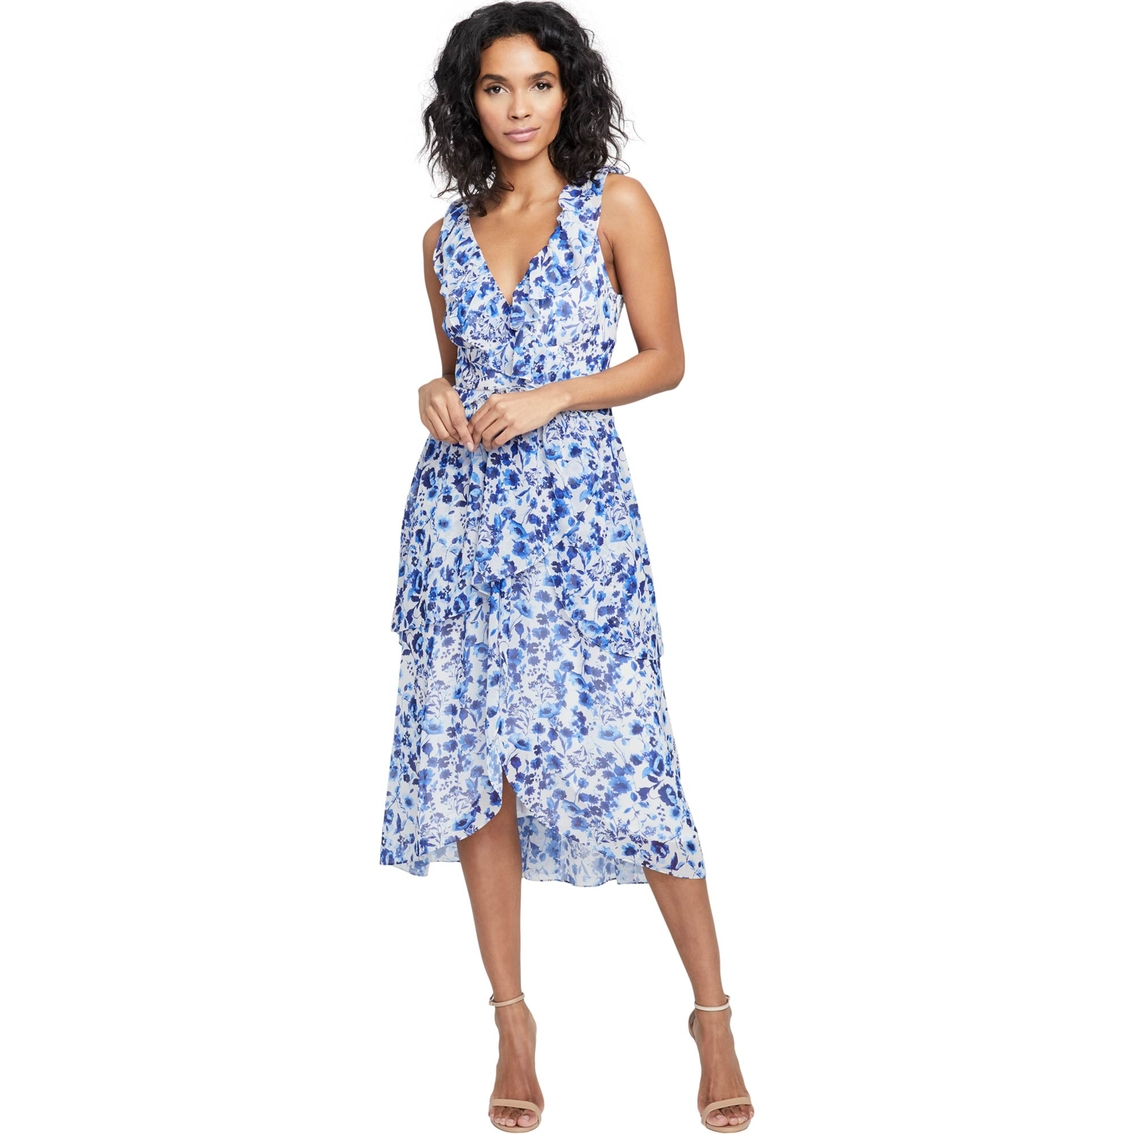 Rachel Roy Discount Gowns: Rachel Roy Floral Dress